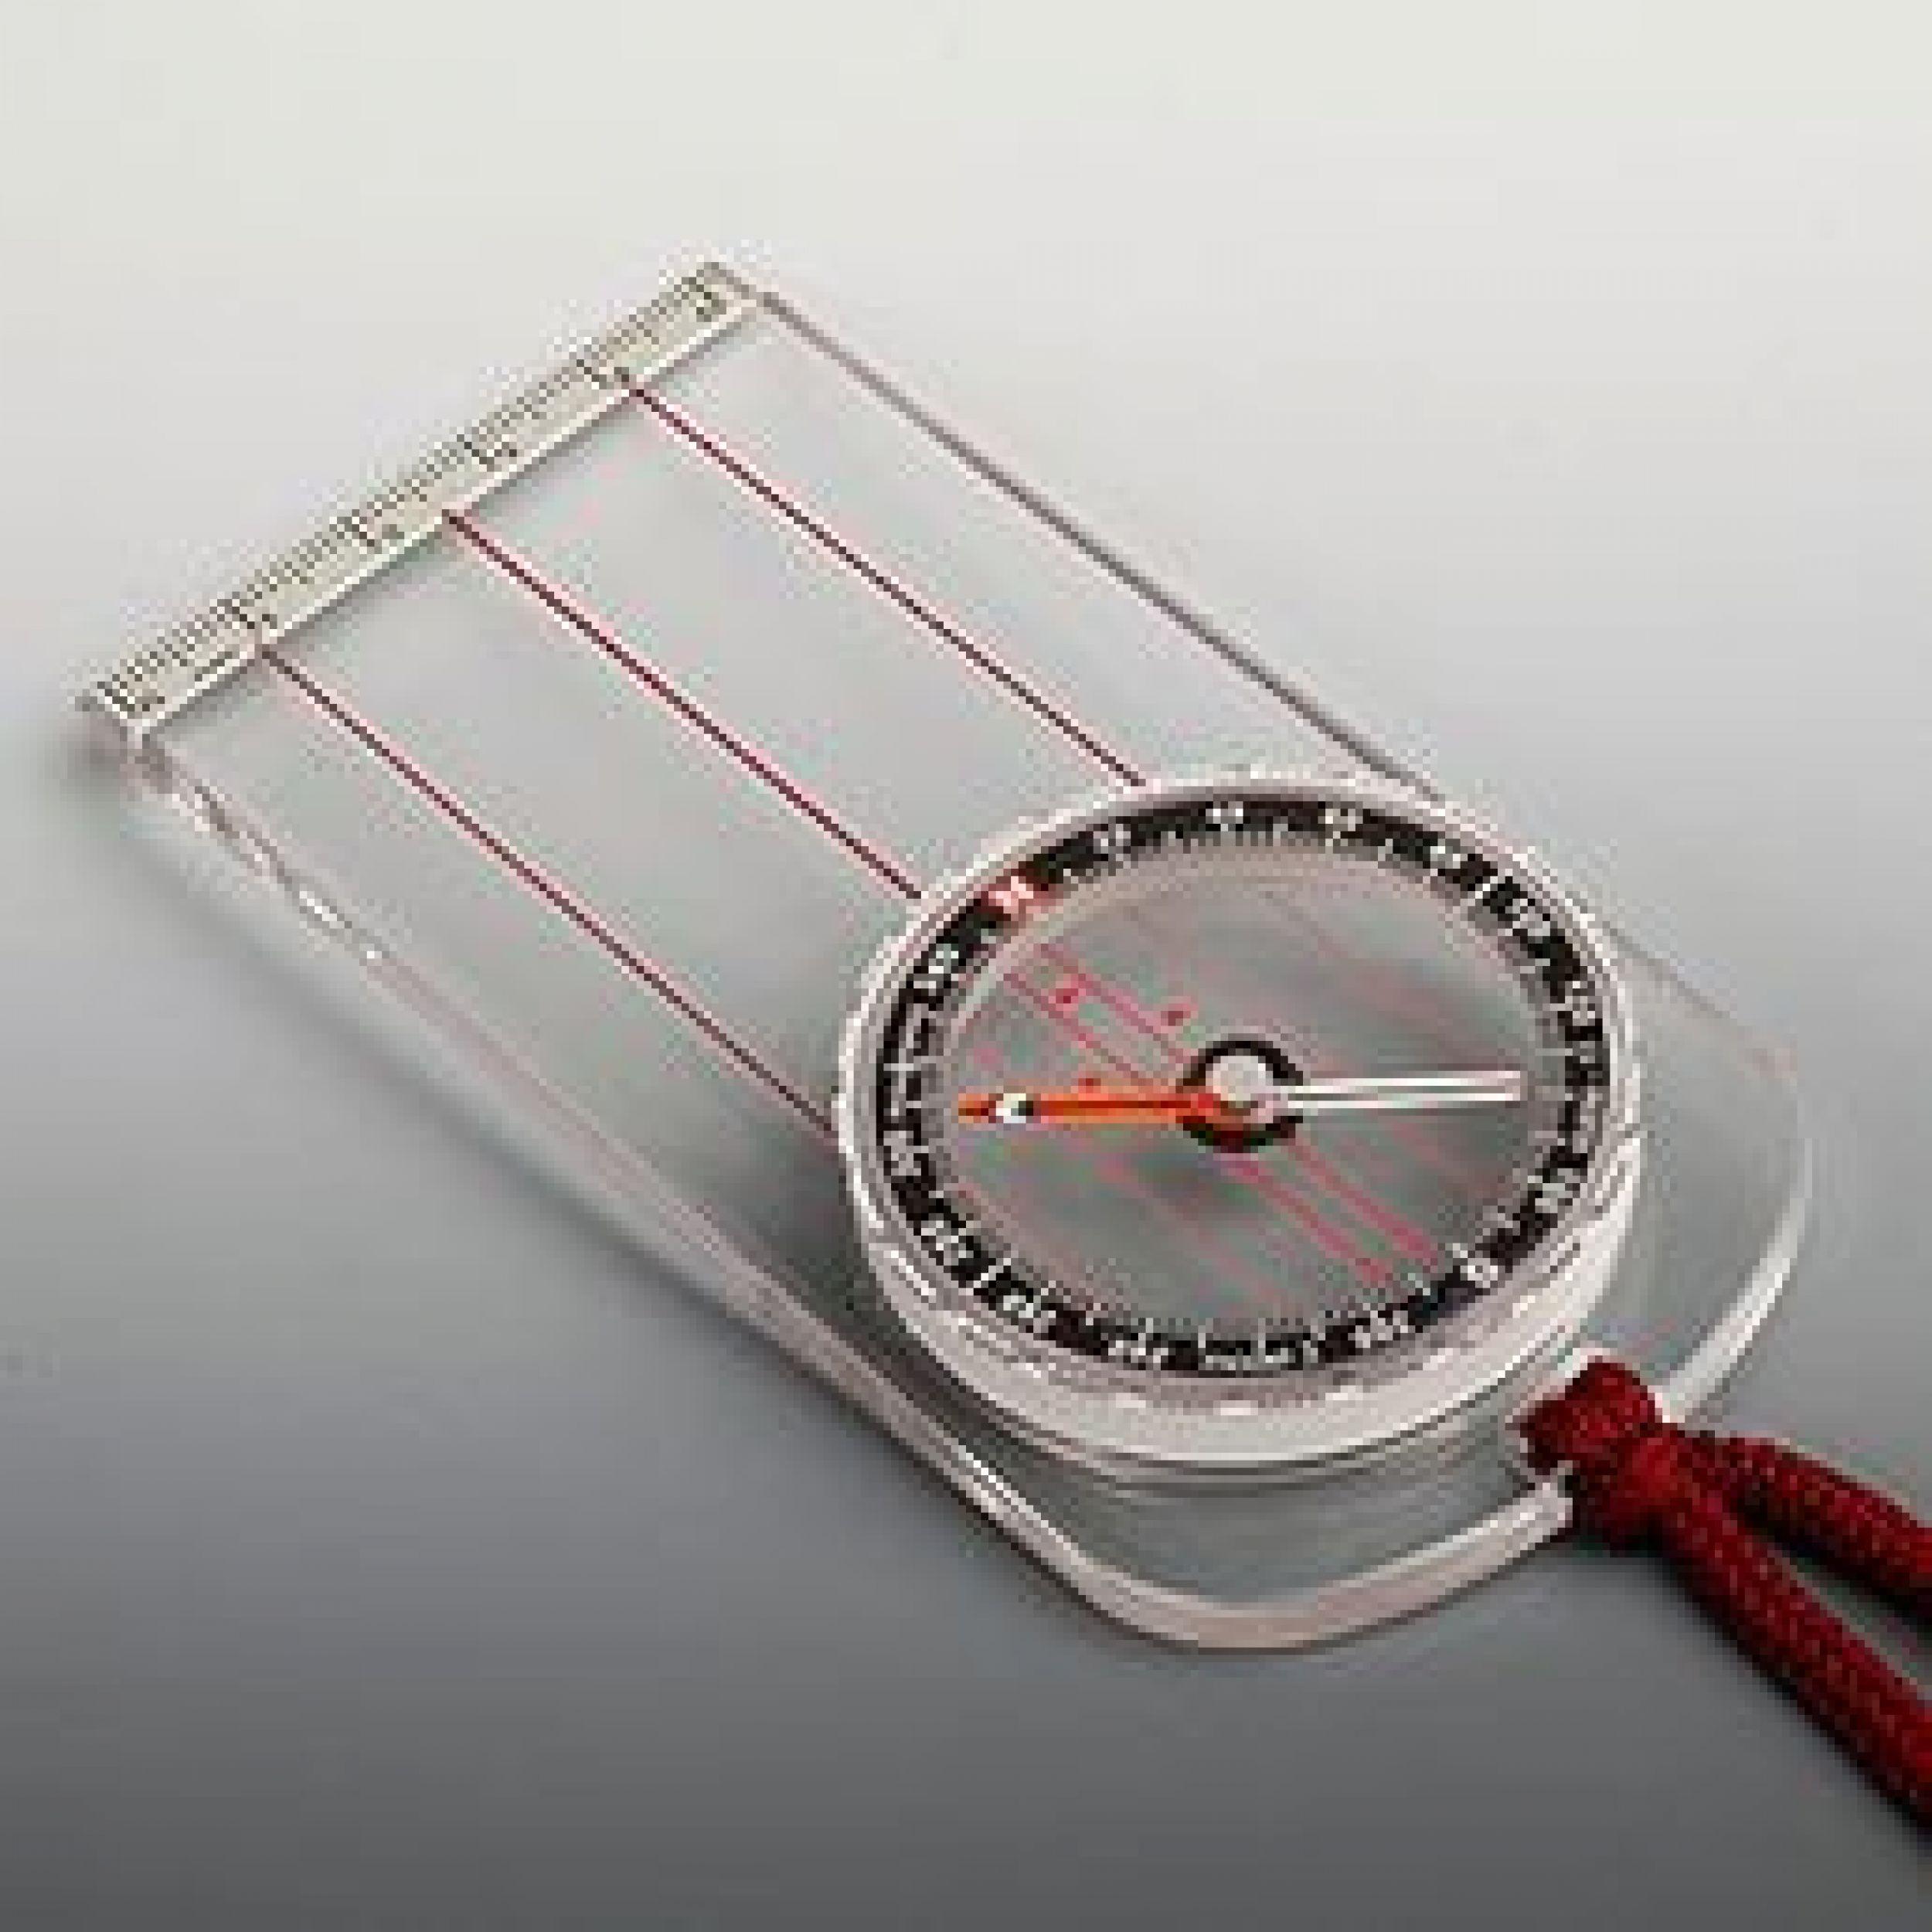 moscompass-model-3s.jpg